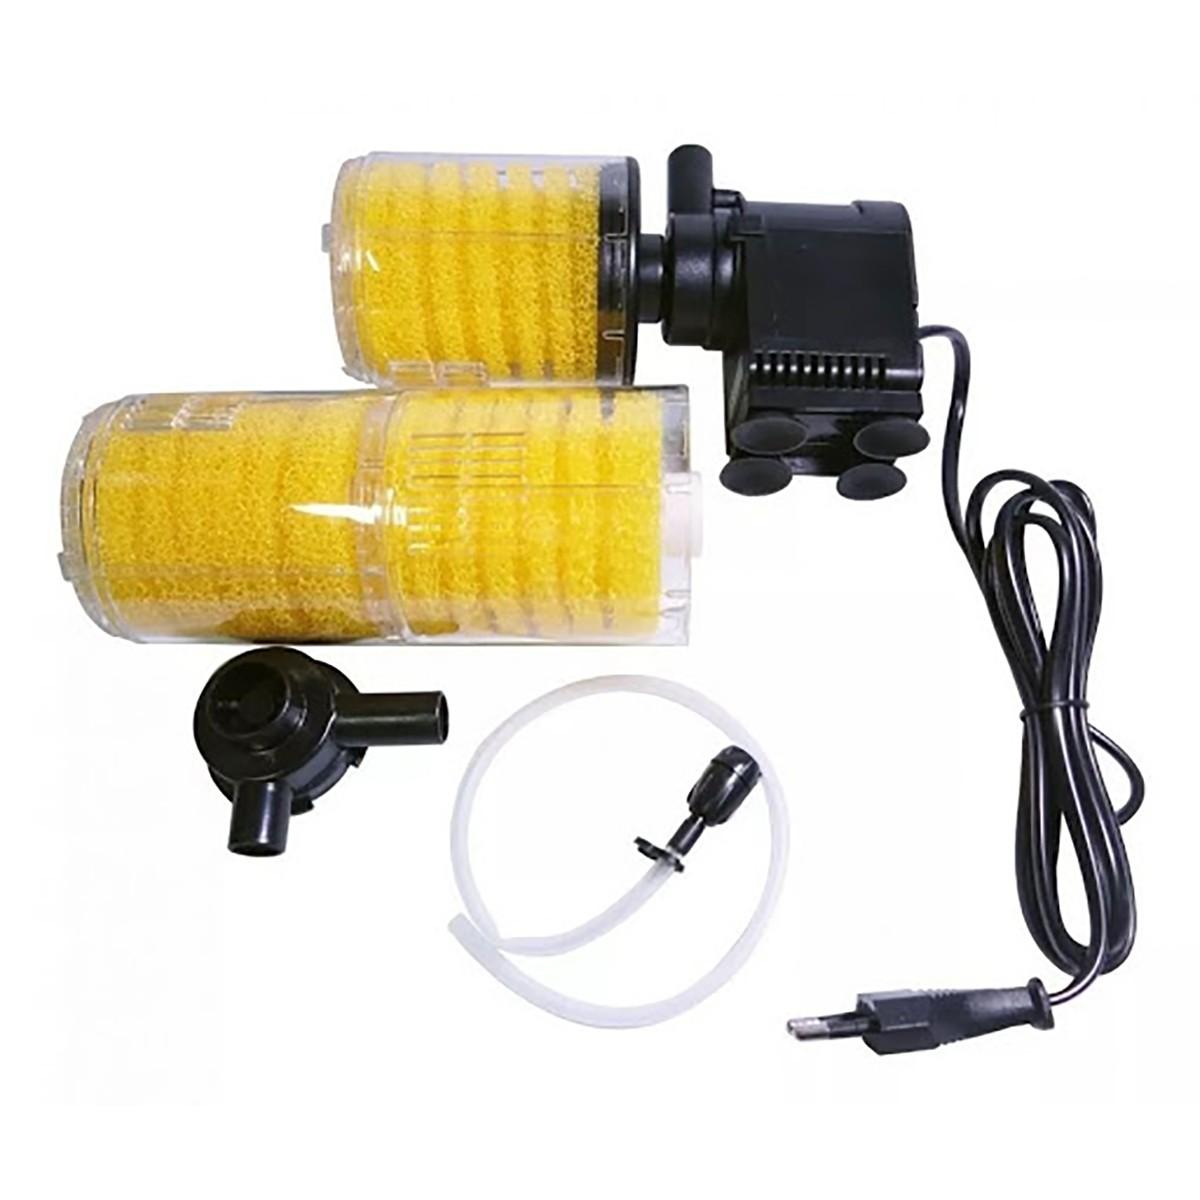 Filtro interno para Aquários Jad 1800 III 13w 700 L/H